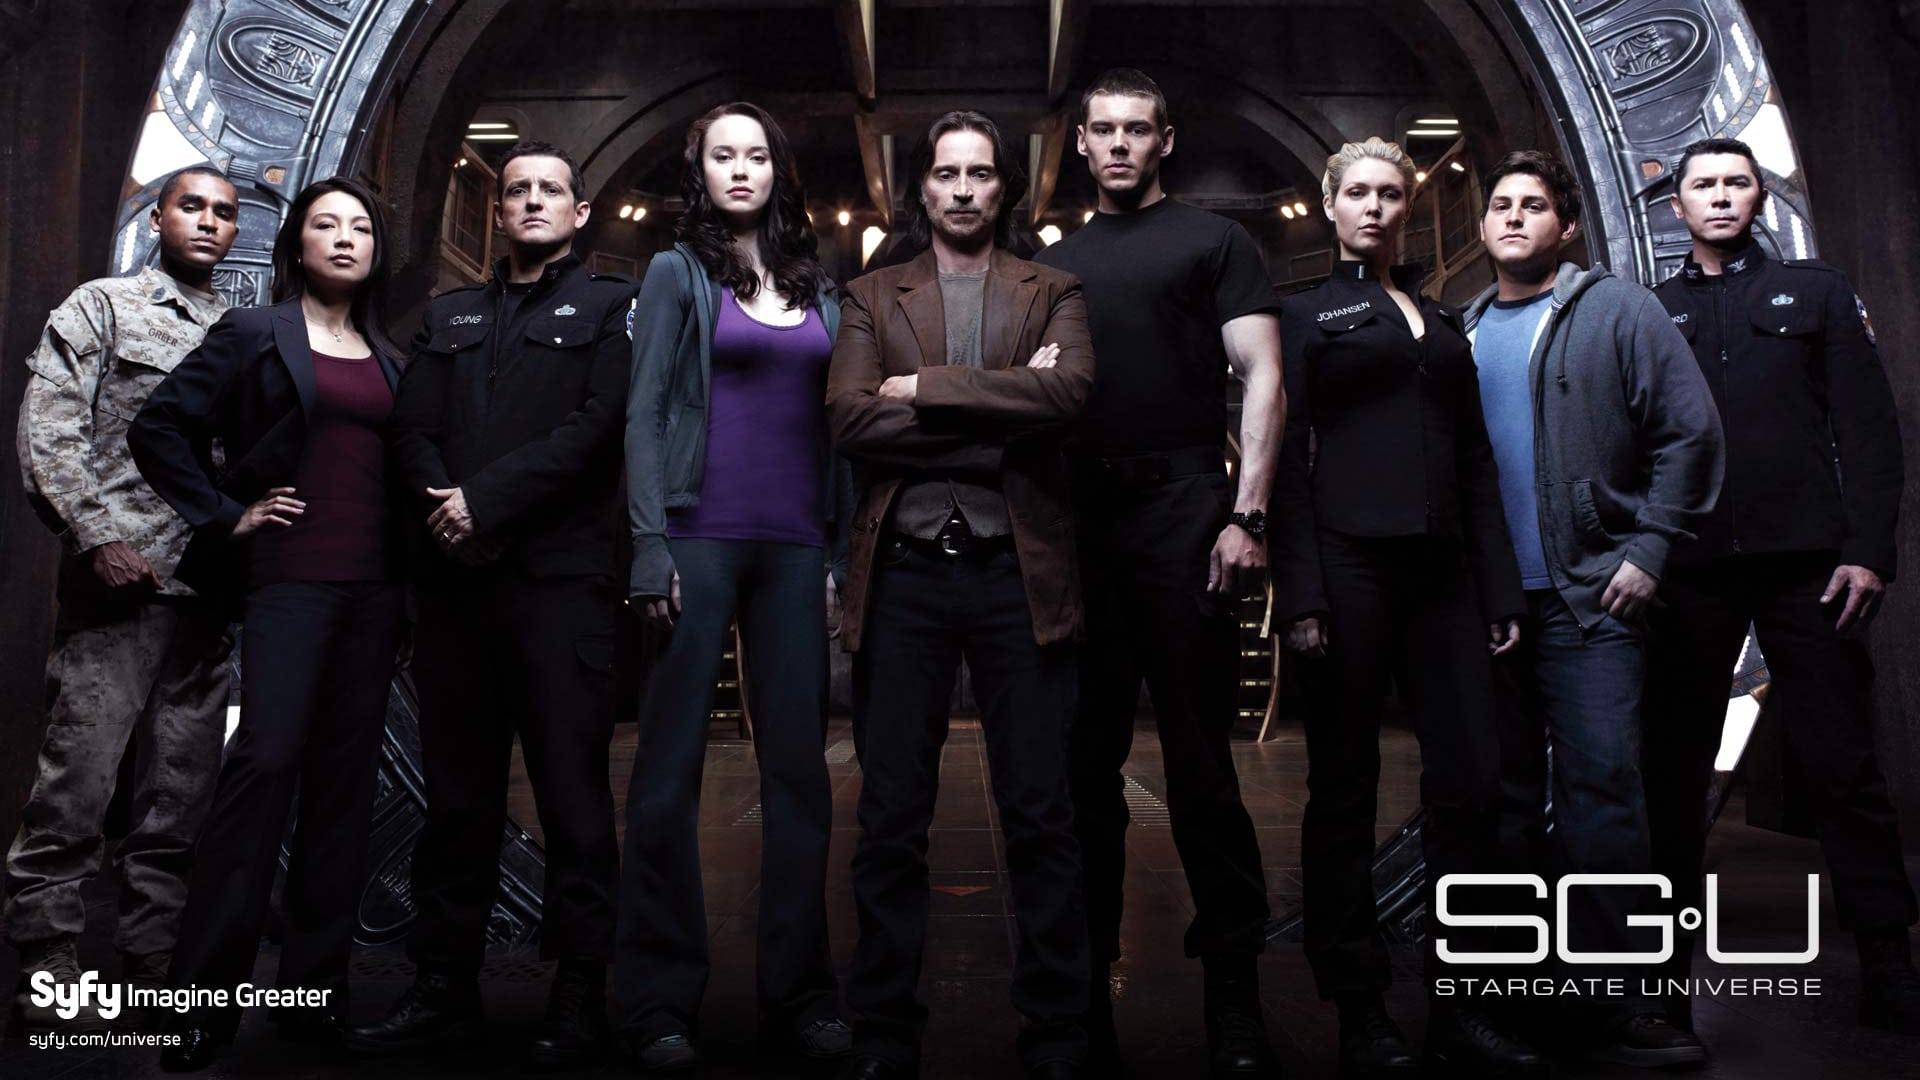 Laatste seizoen Stargate Universe gaat 20 mei verder op Syfy